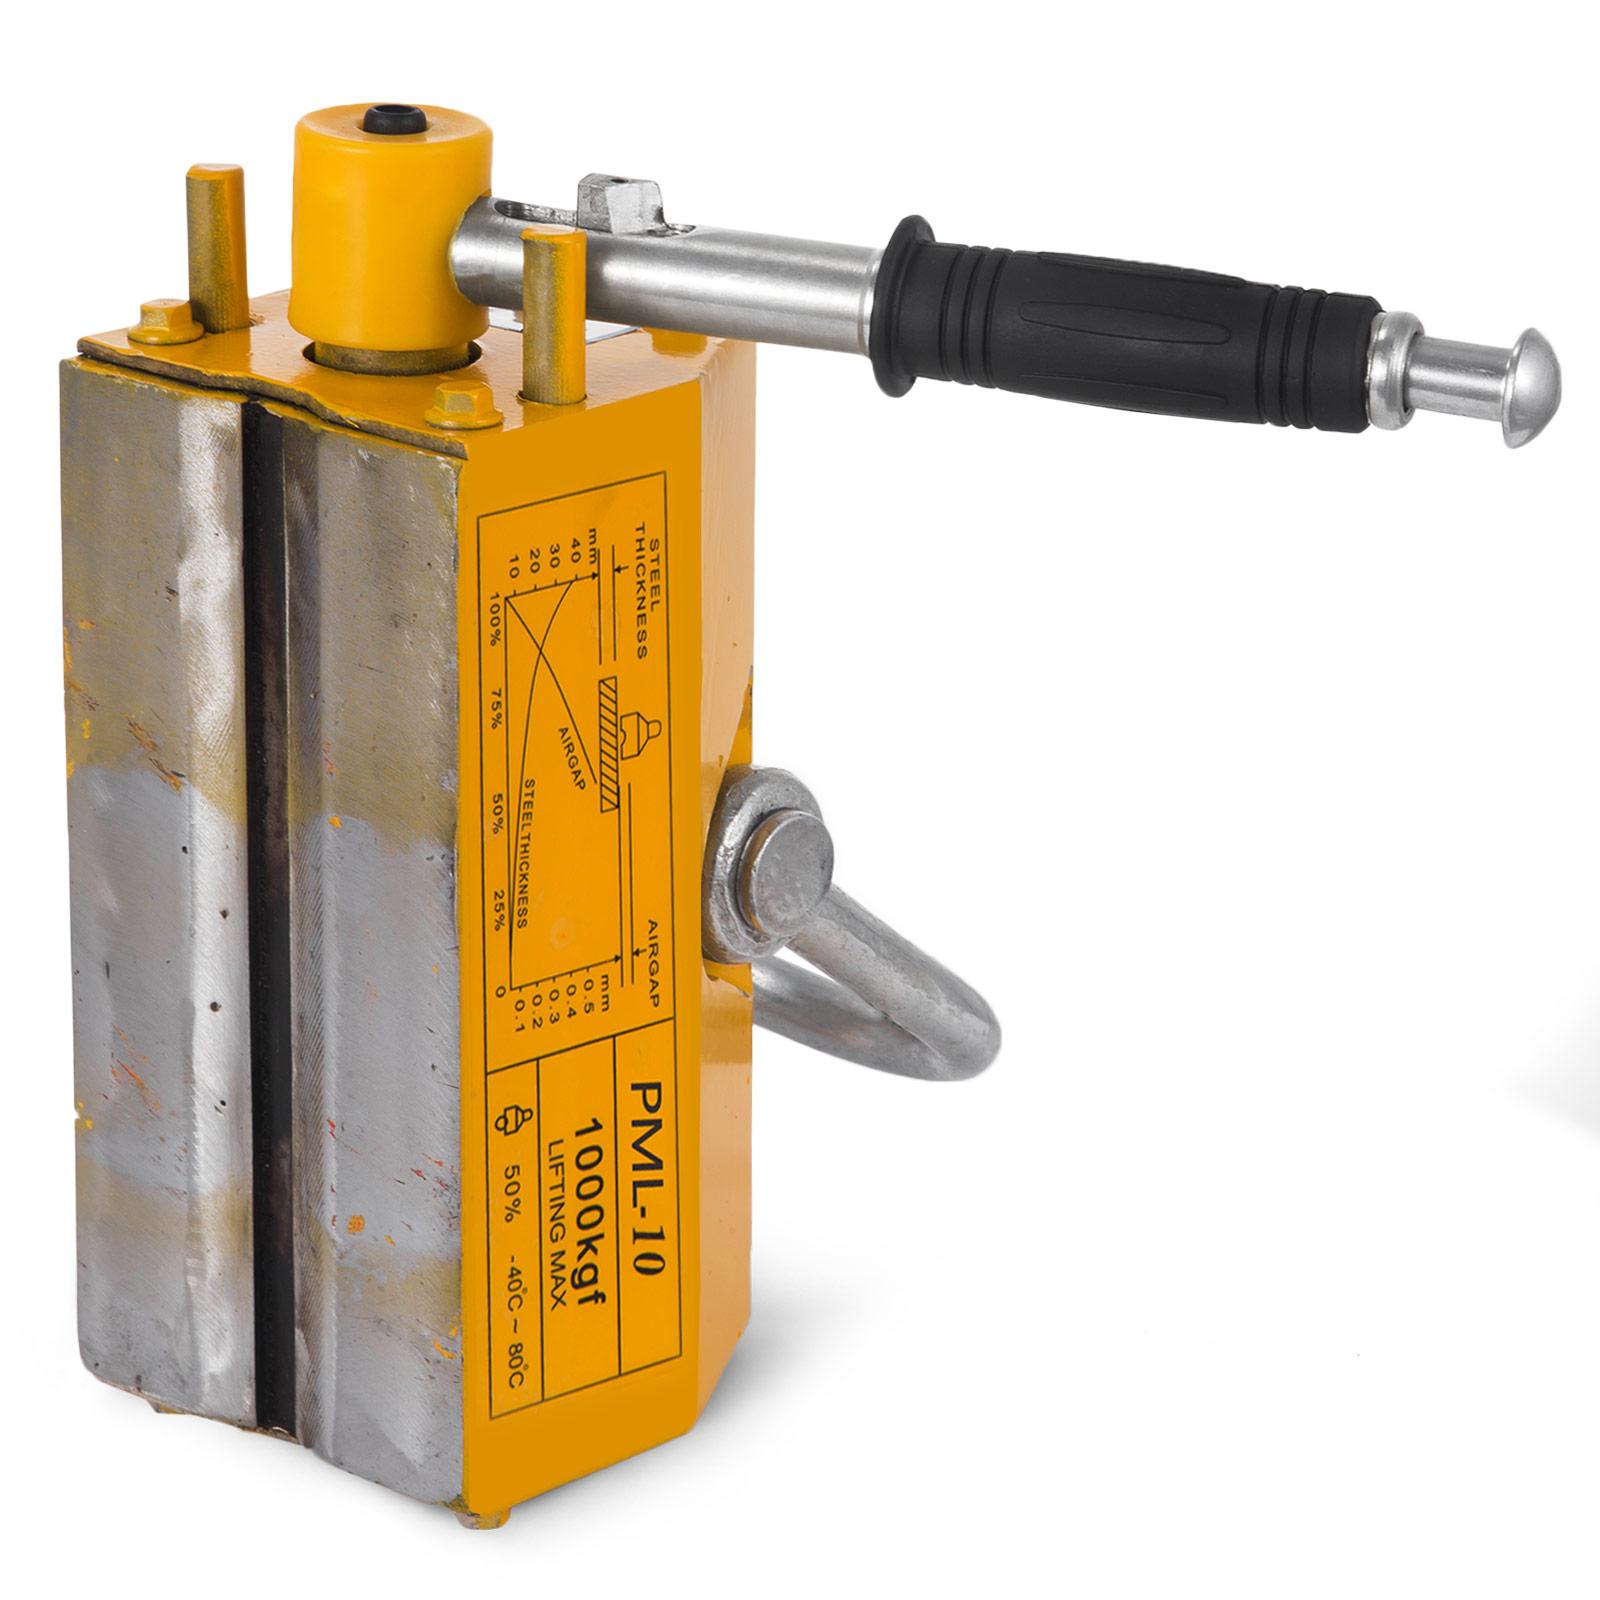 100-300-600-1000KG-Steel-Magnetic-Lifter-Heavy-Duty-Crane-Hoist-Lifting-Magnet miniature 66